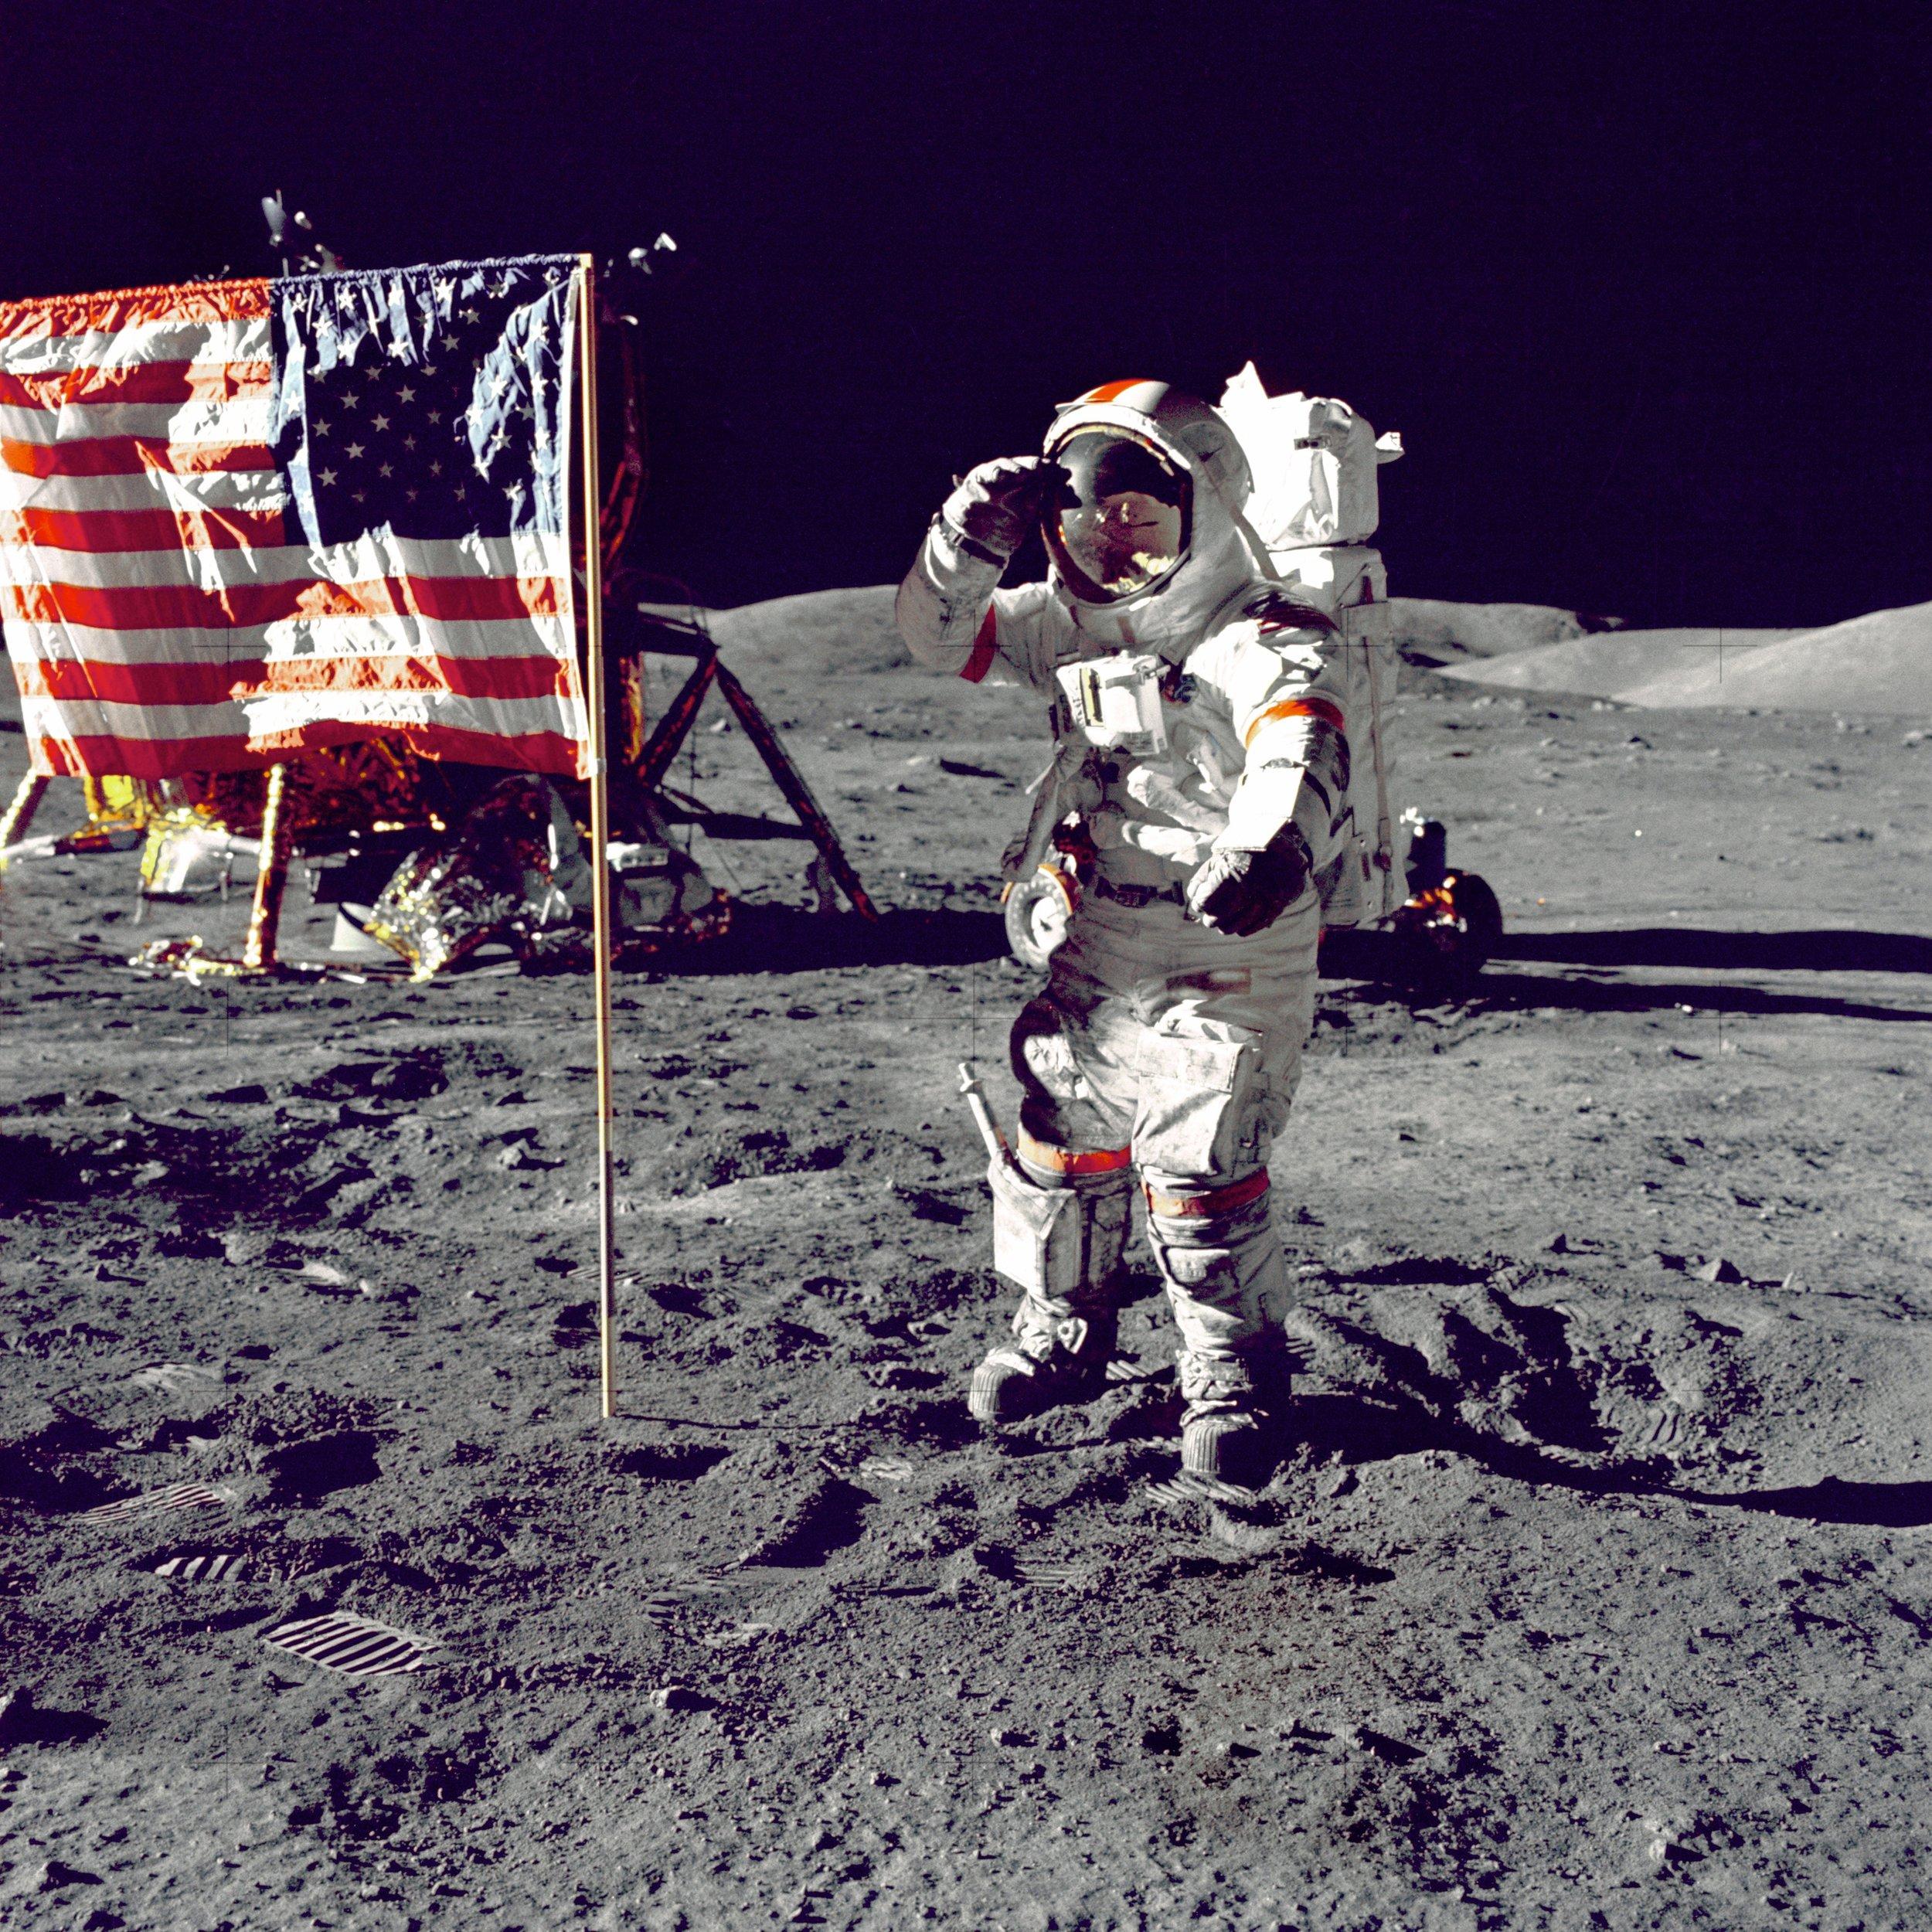 Footprints On The Moon - Photo by NASAon Unsplash